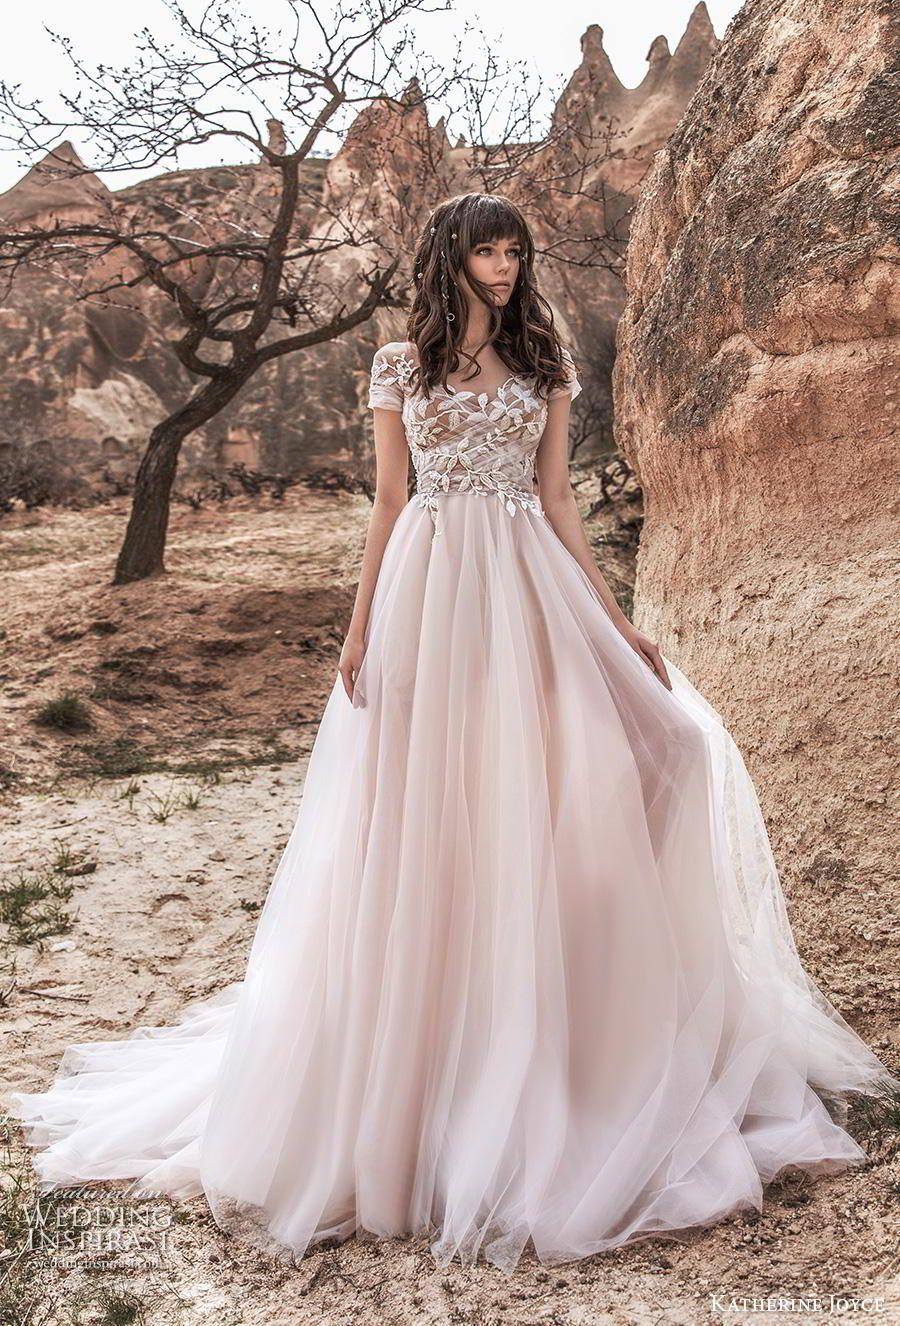 Katherine Joyce 2020 Wedding Dresses Wind Desert Bridal Collection Wedding Inspirasi Wedding Dress Guide Bridal Dresses Sheer Wedding Dress [ 1326 x 900 Pixel ]